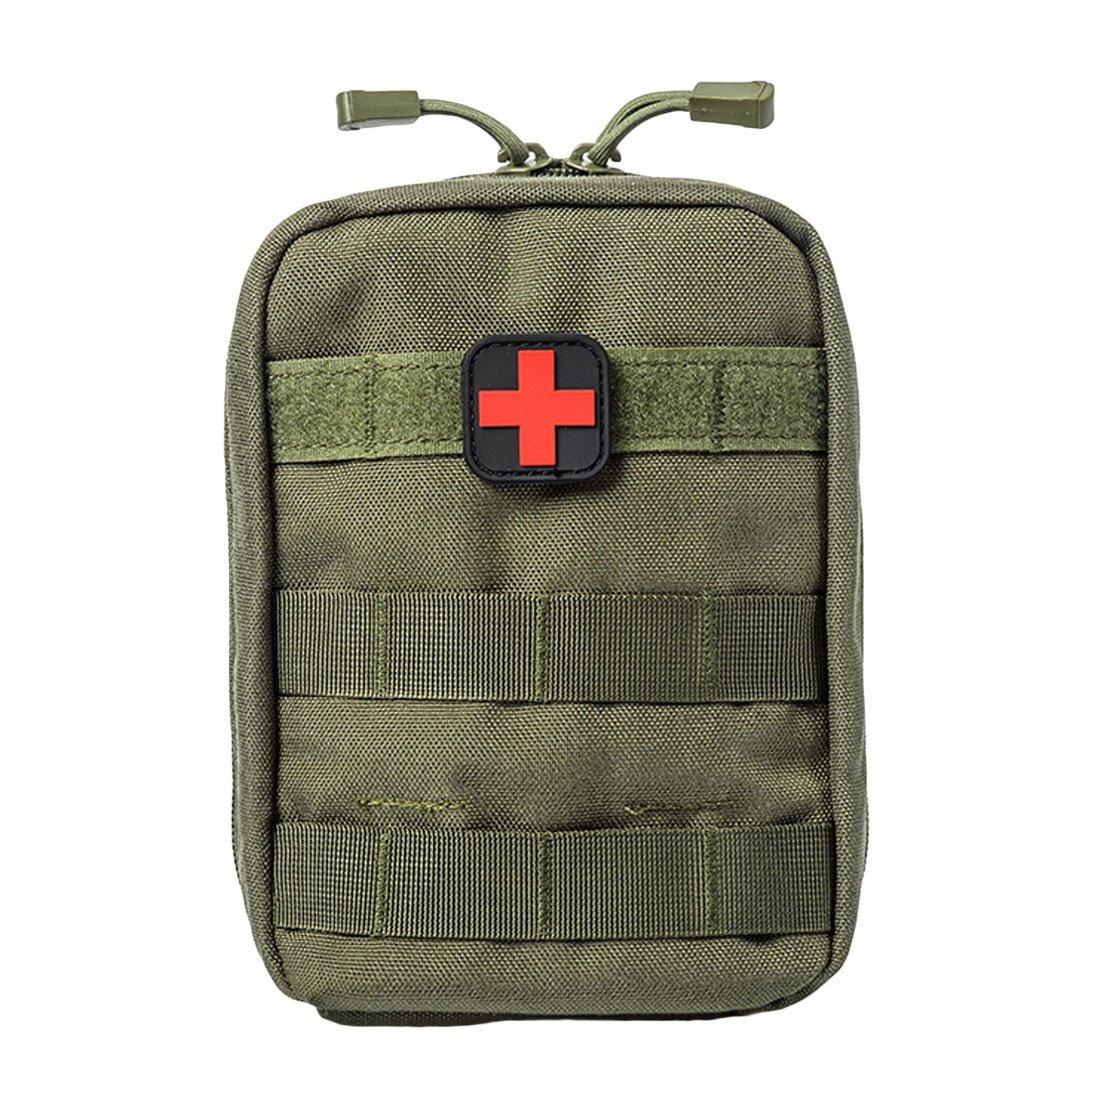 UU19EE Bolsa médica de Primeros Auxilios, Bolsa de Utilidad táctica, Negro de Nylon 1000D